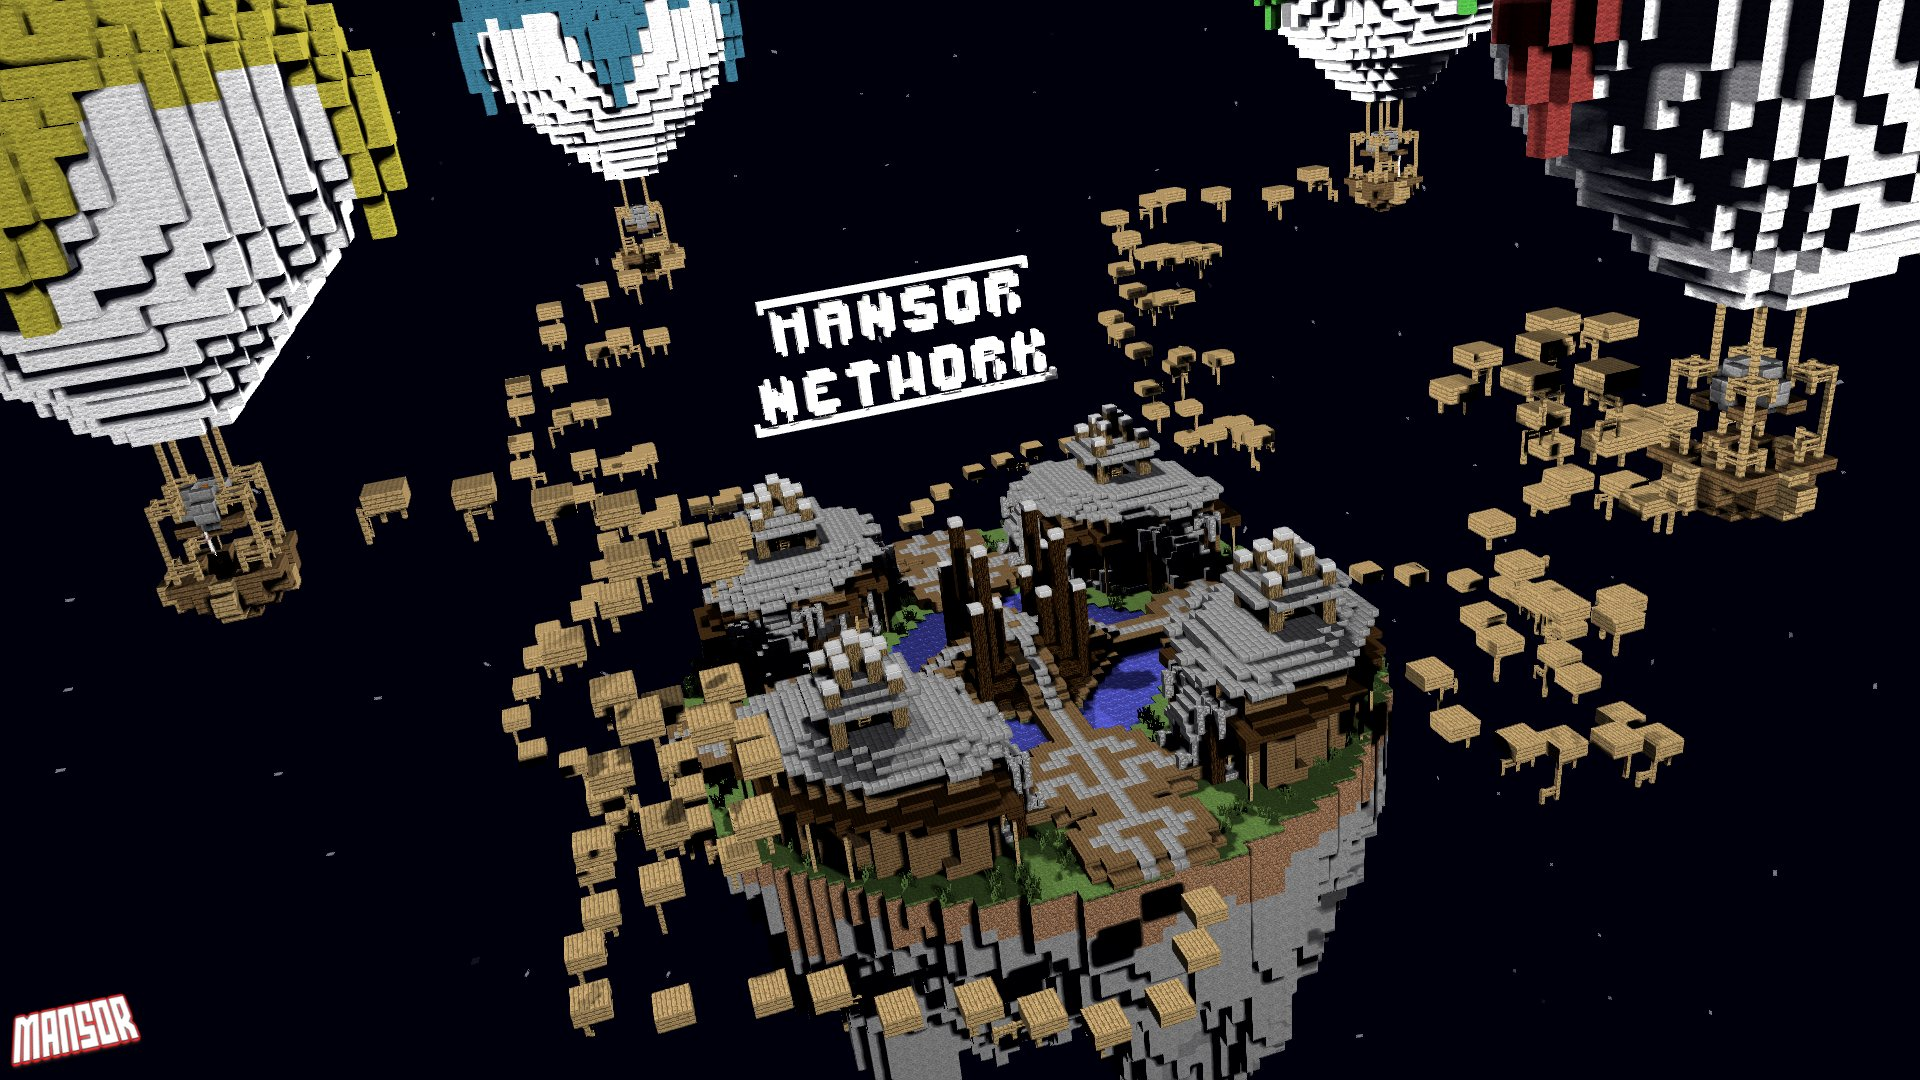 Mansor Network